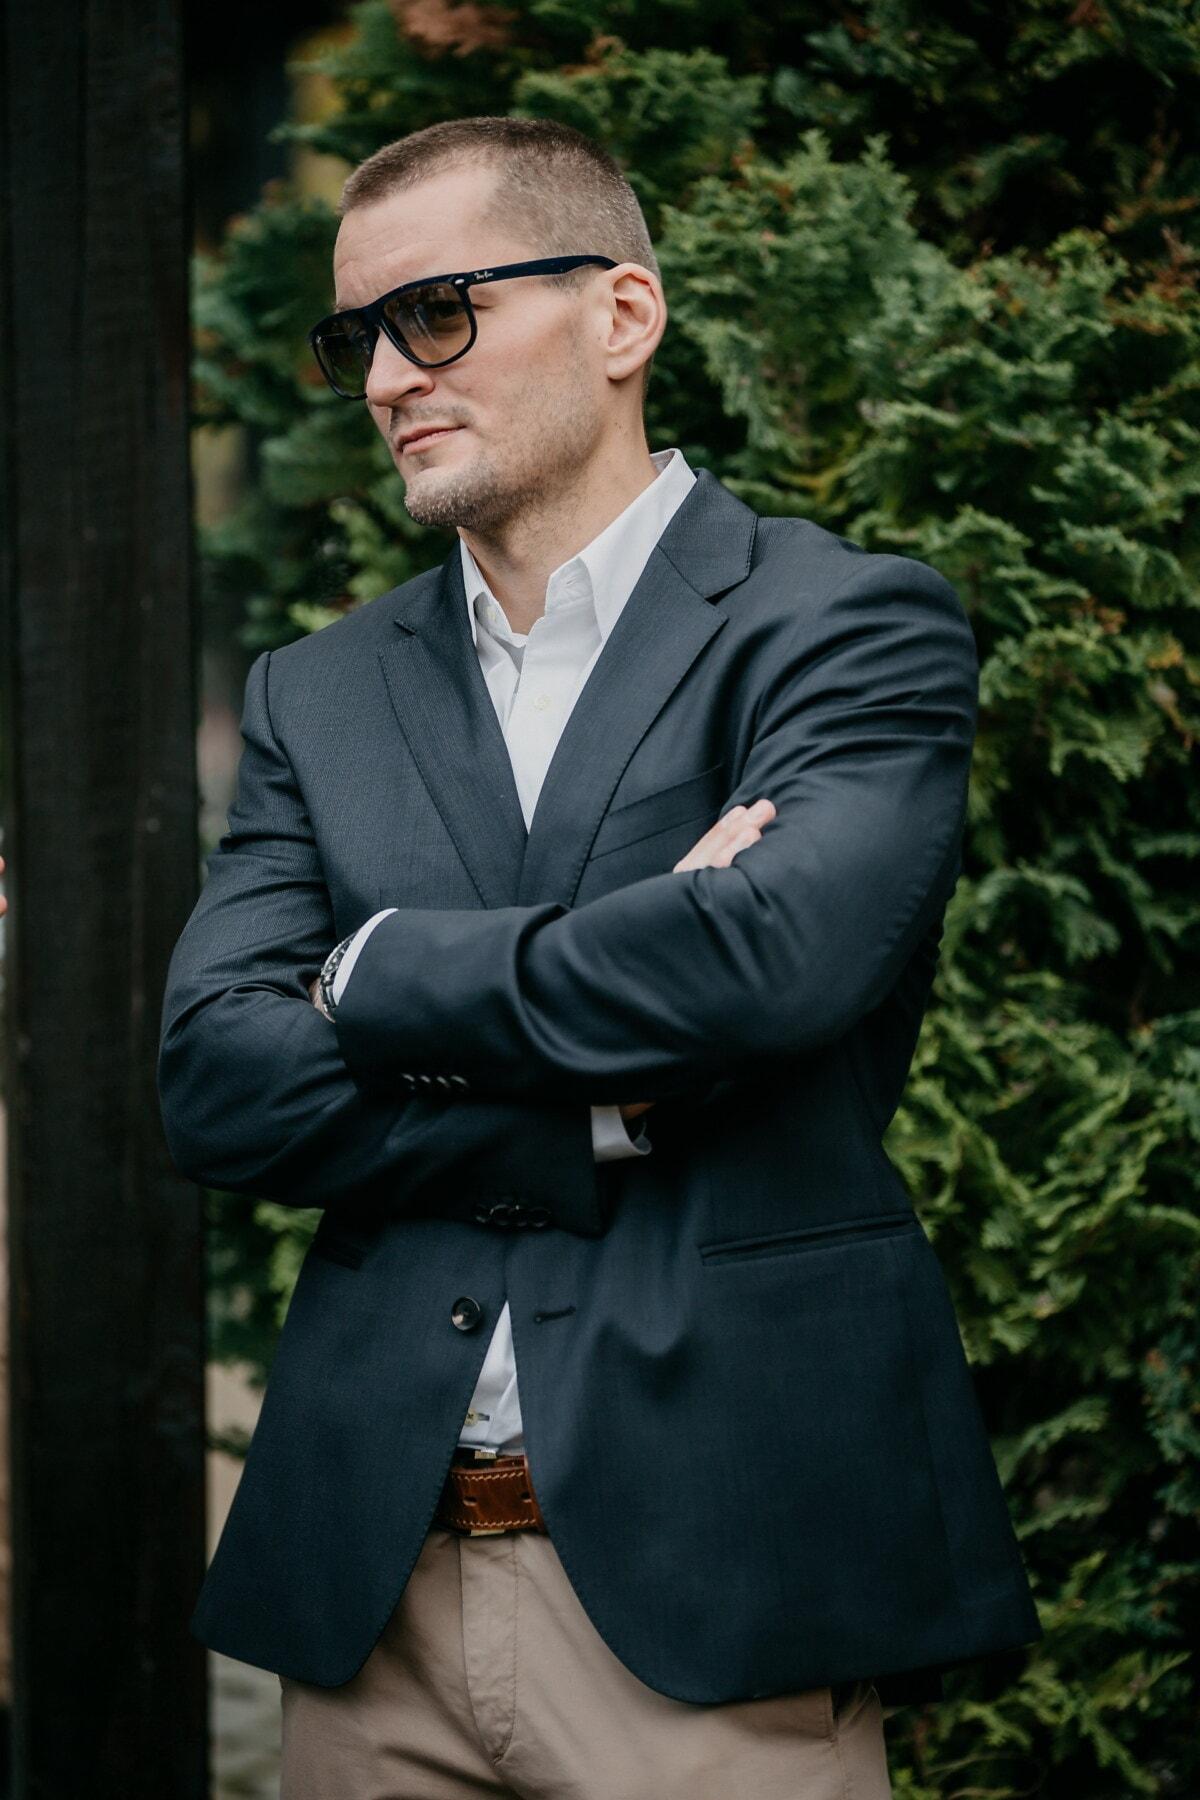 man, handsome, photo model, posing, manager, confidence, businessman, sunglasses, beard, garment